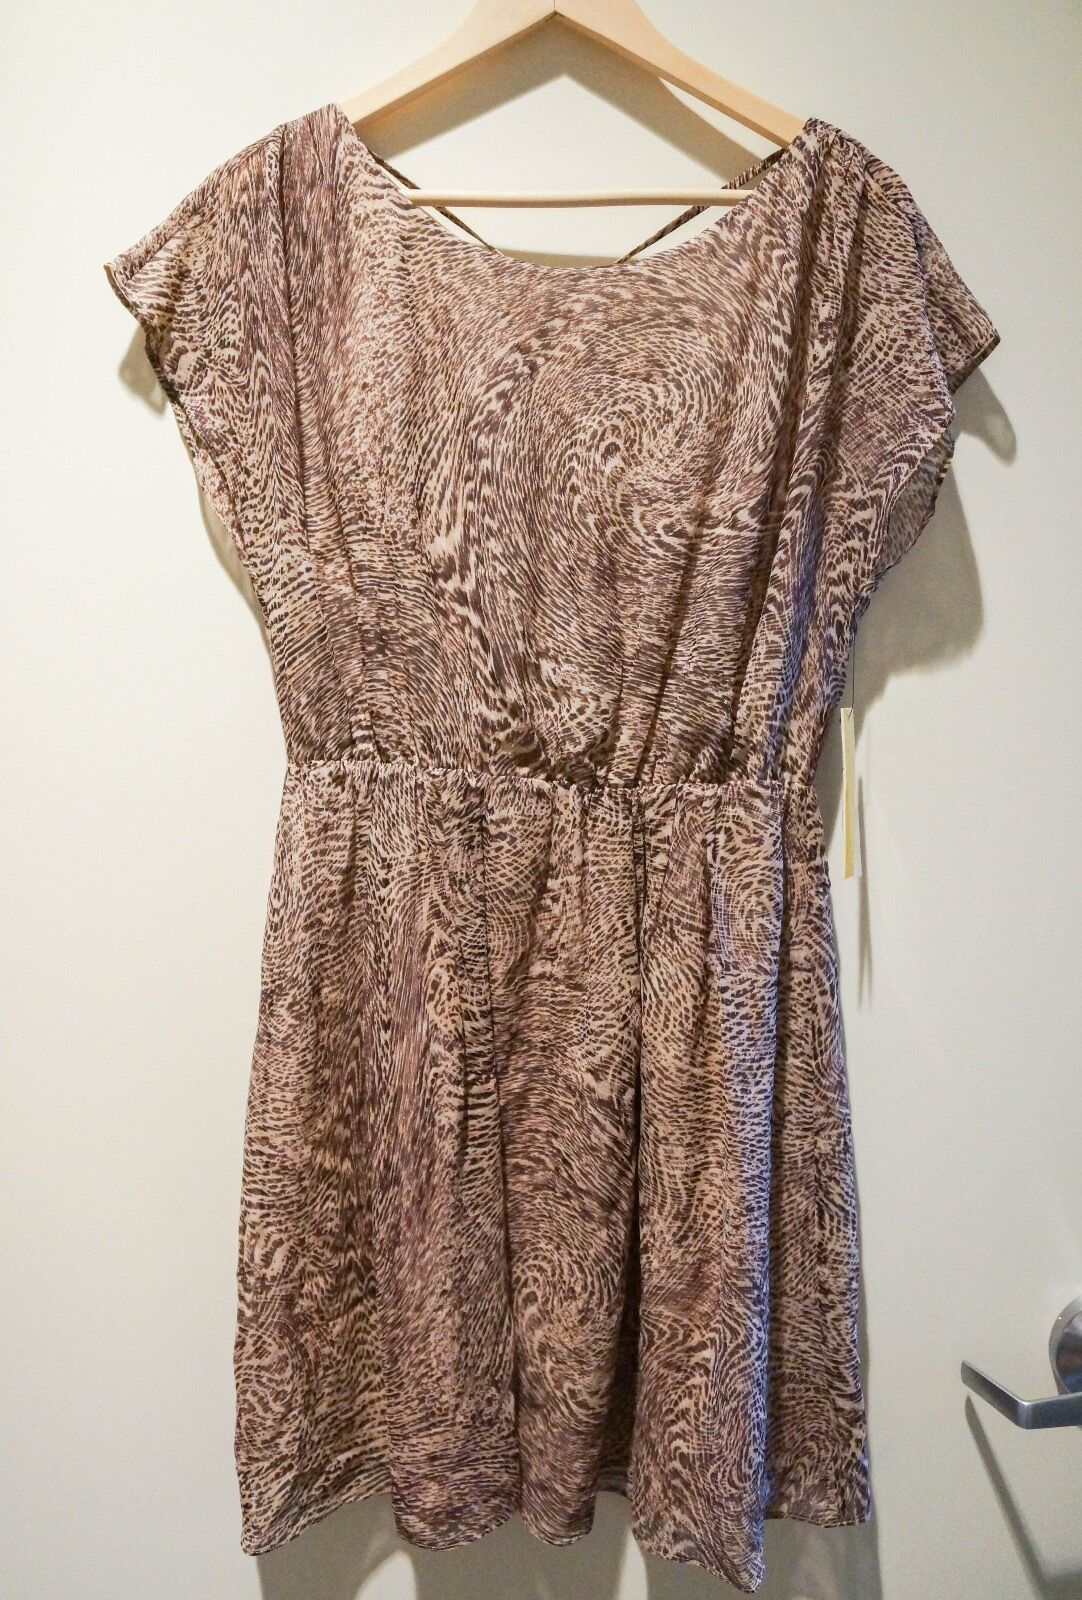 Alice and Olivia C203640600 braun Multi Silk Dress Medium